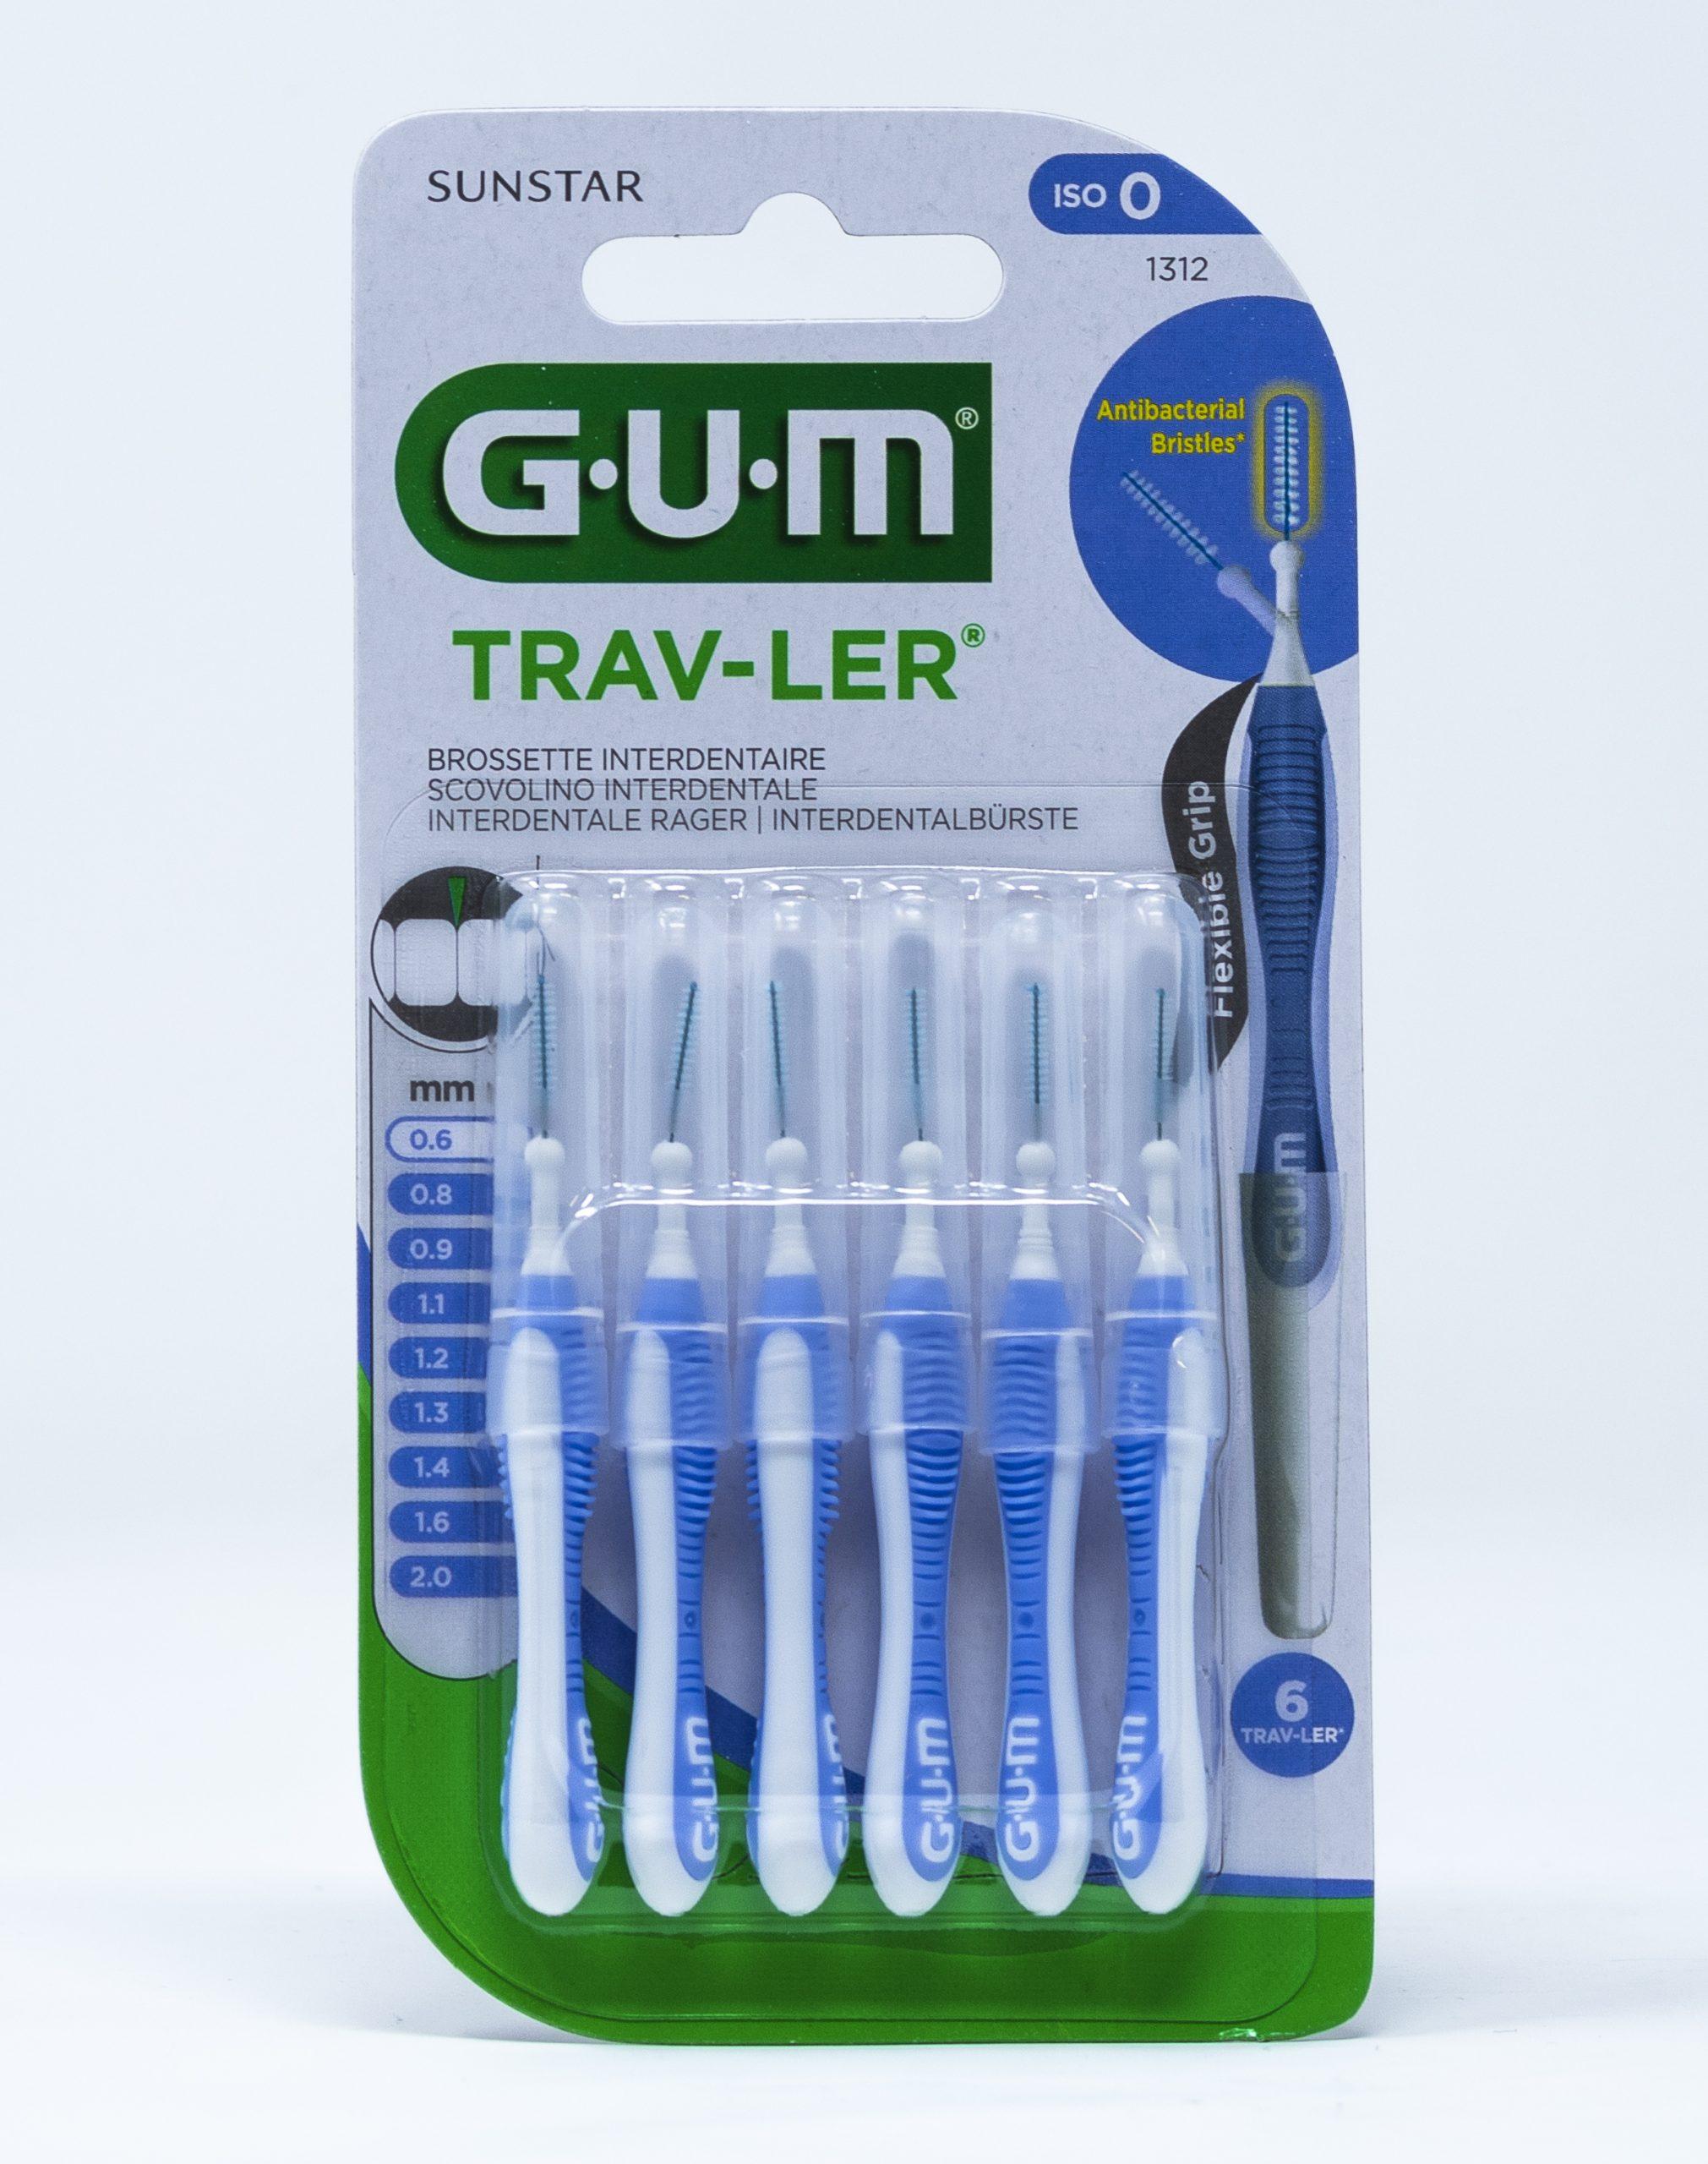 Gum Scovolino Trav-Ler ISO 0 – 0,6 mm | 1312